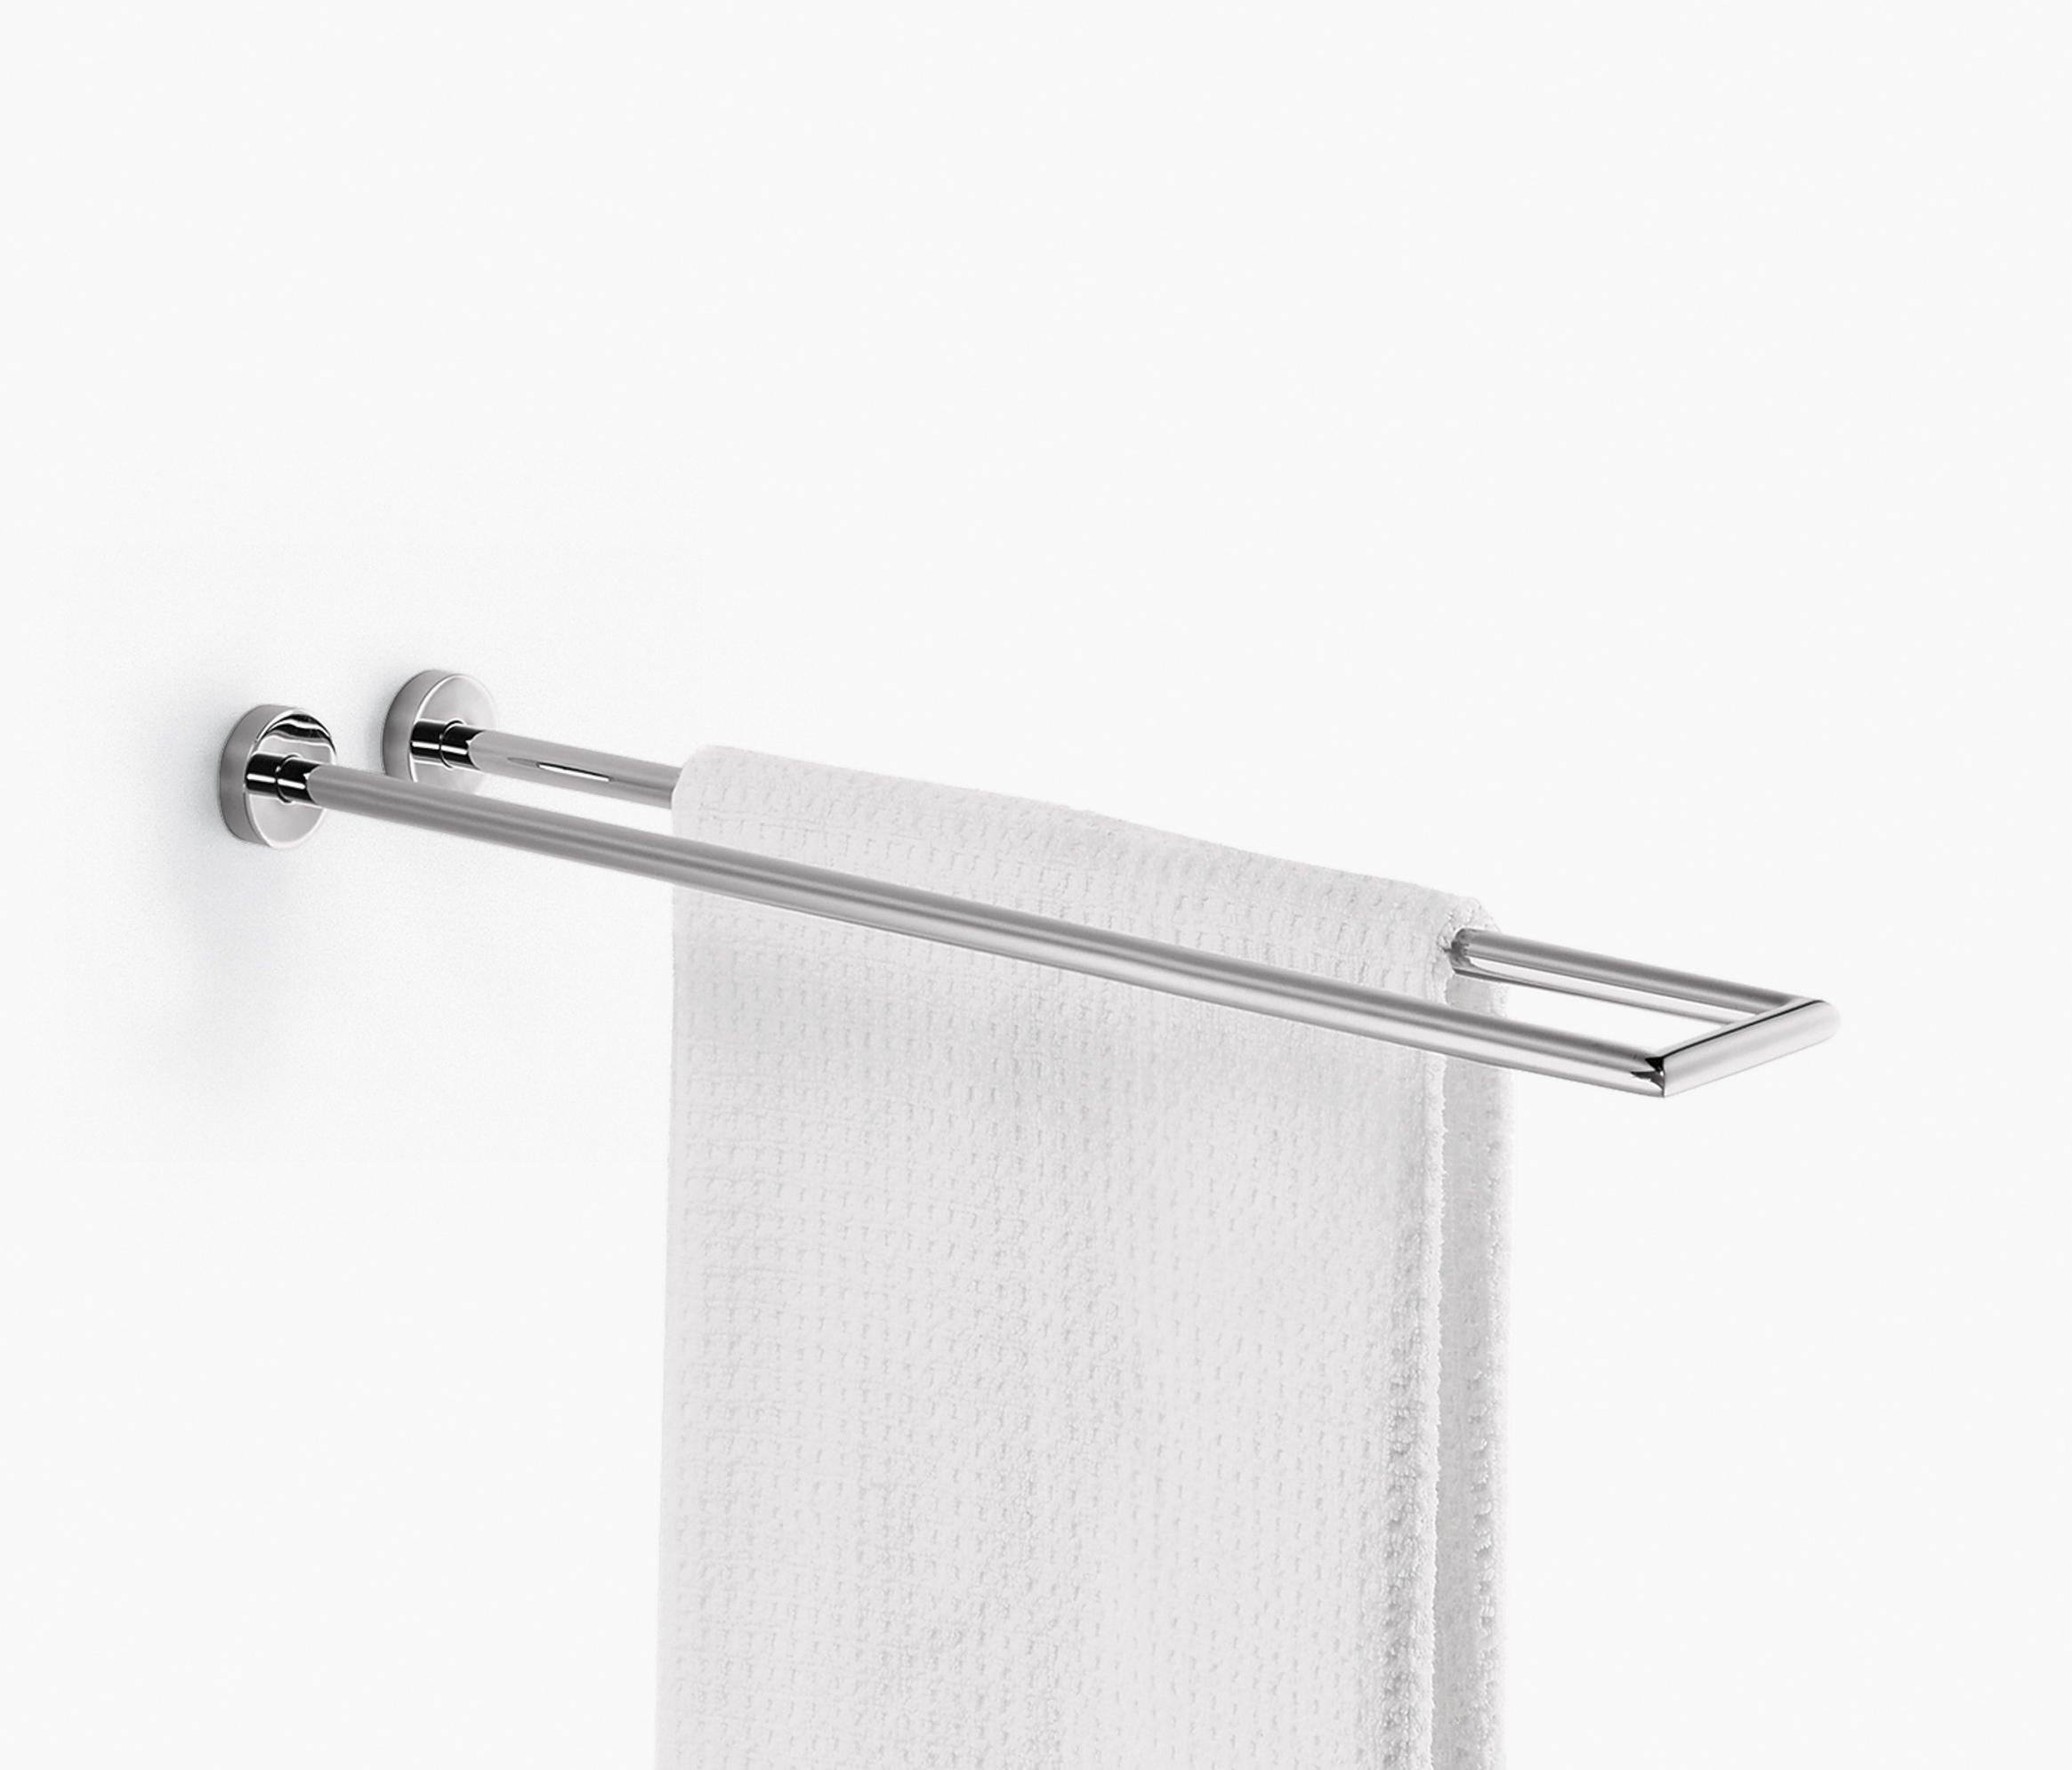 tara logic towel bar towel rails from dornbracht. Black Bedroom Furniture Sets. Home Design Ideas